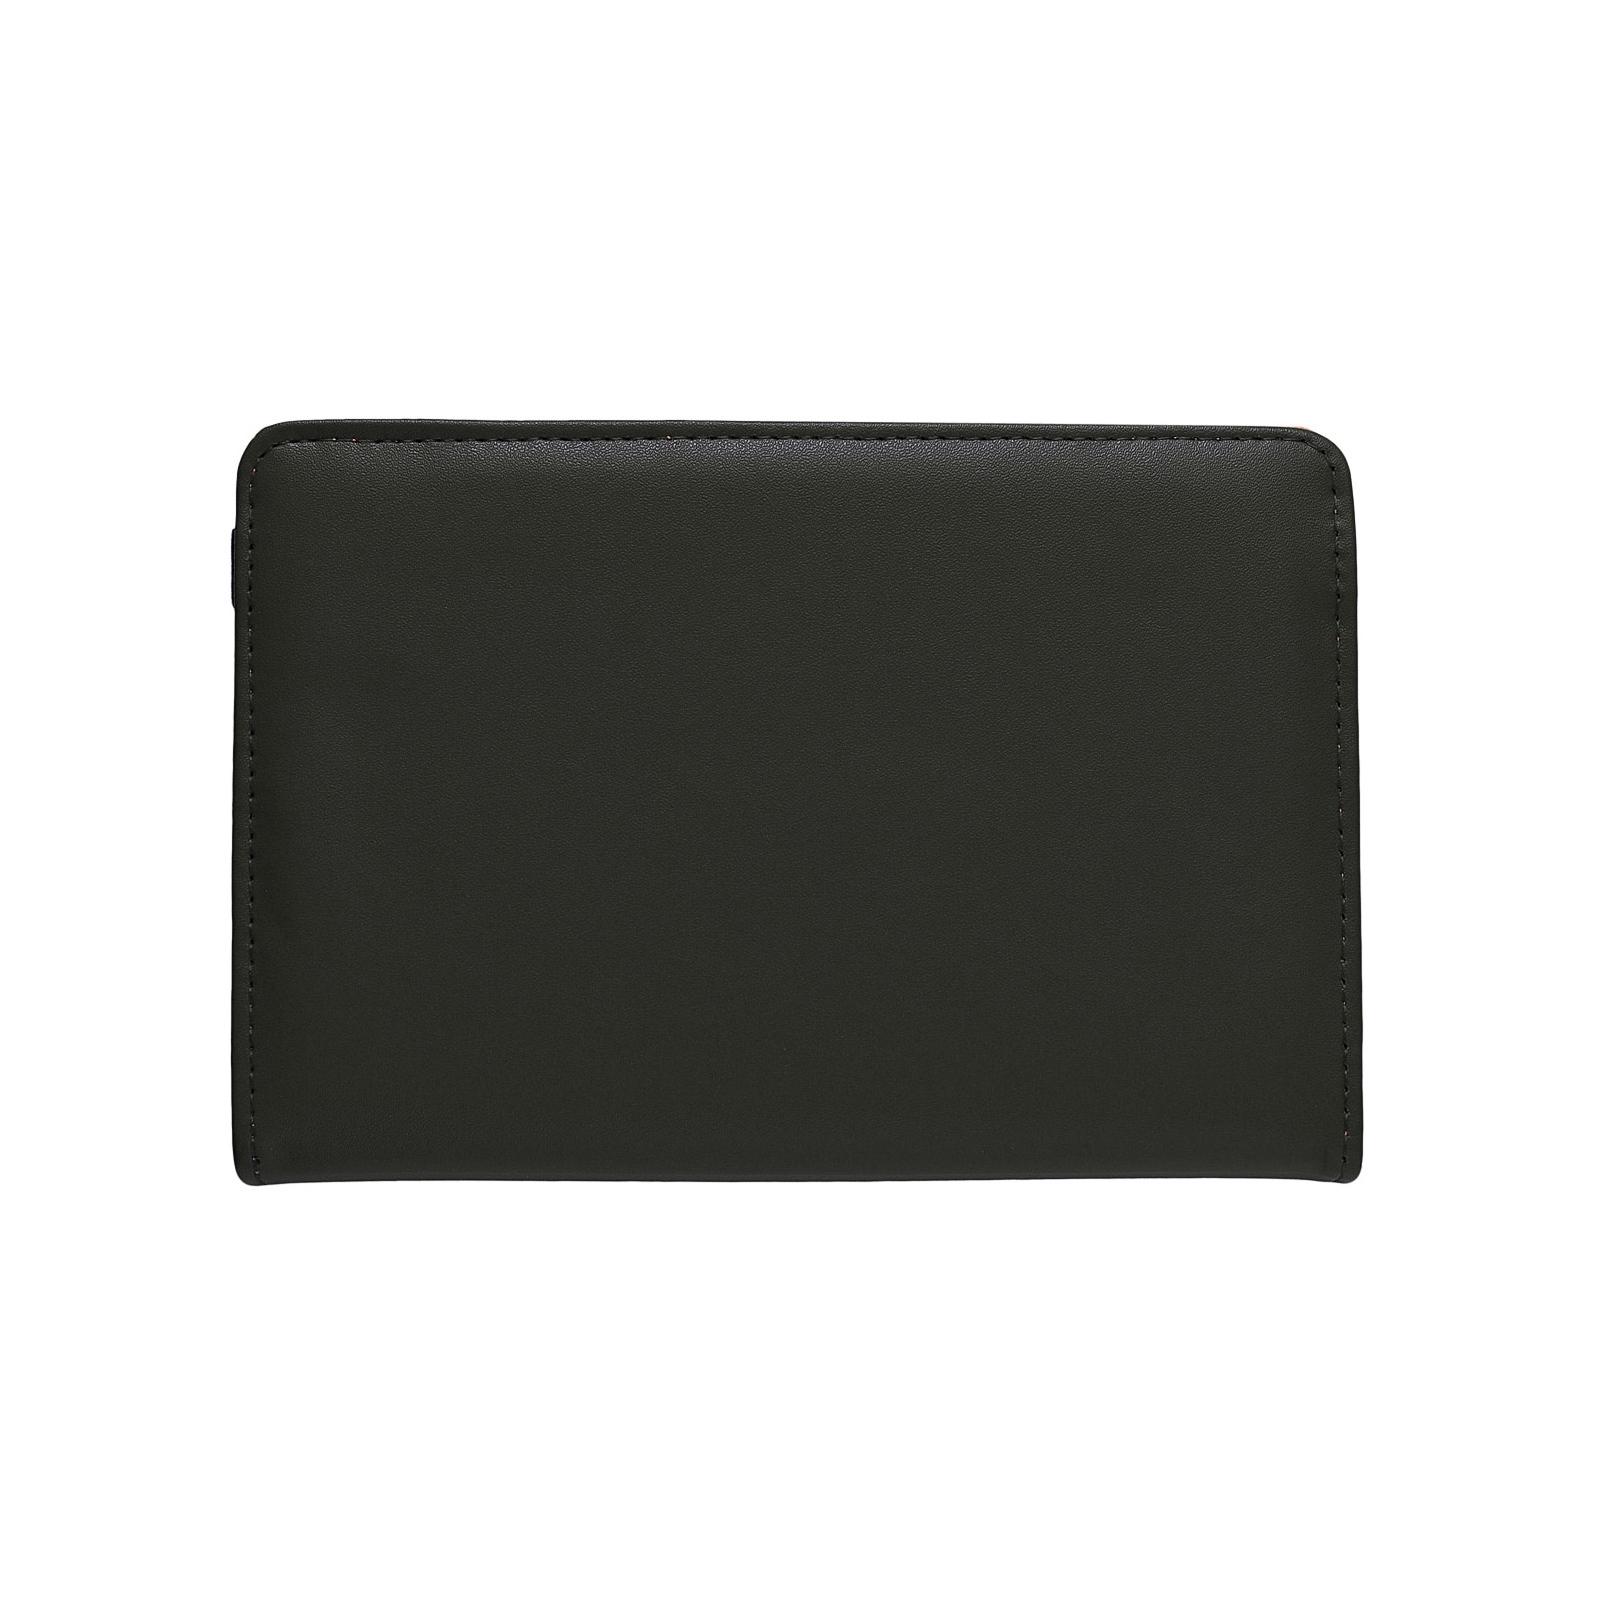 "Чехол для планшета Grand-X universal 7"" Grand-X TC03 Black (UTC - GX7TC03B)"